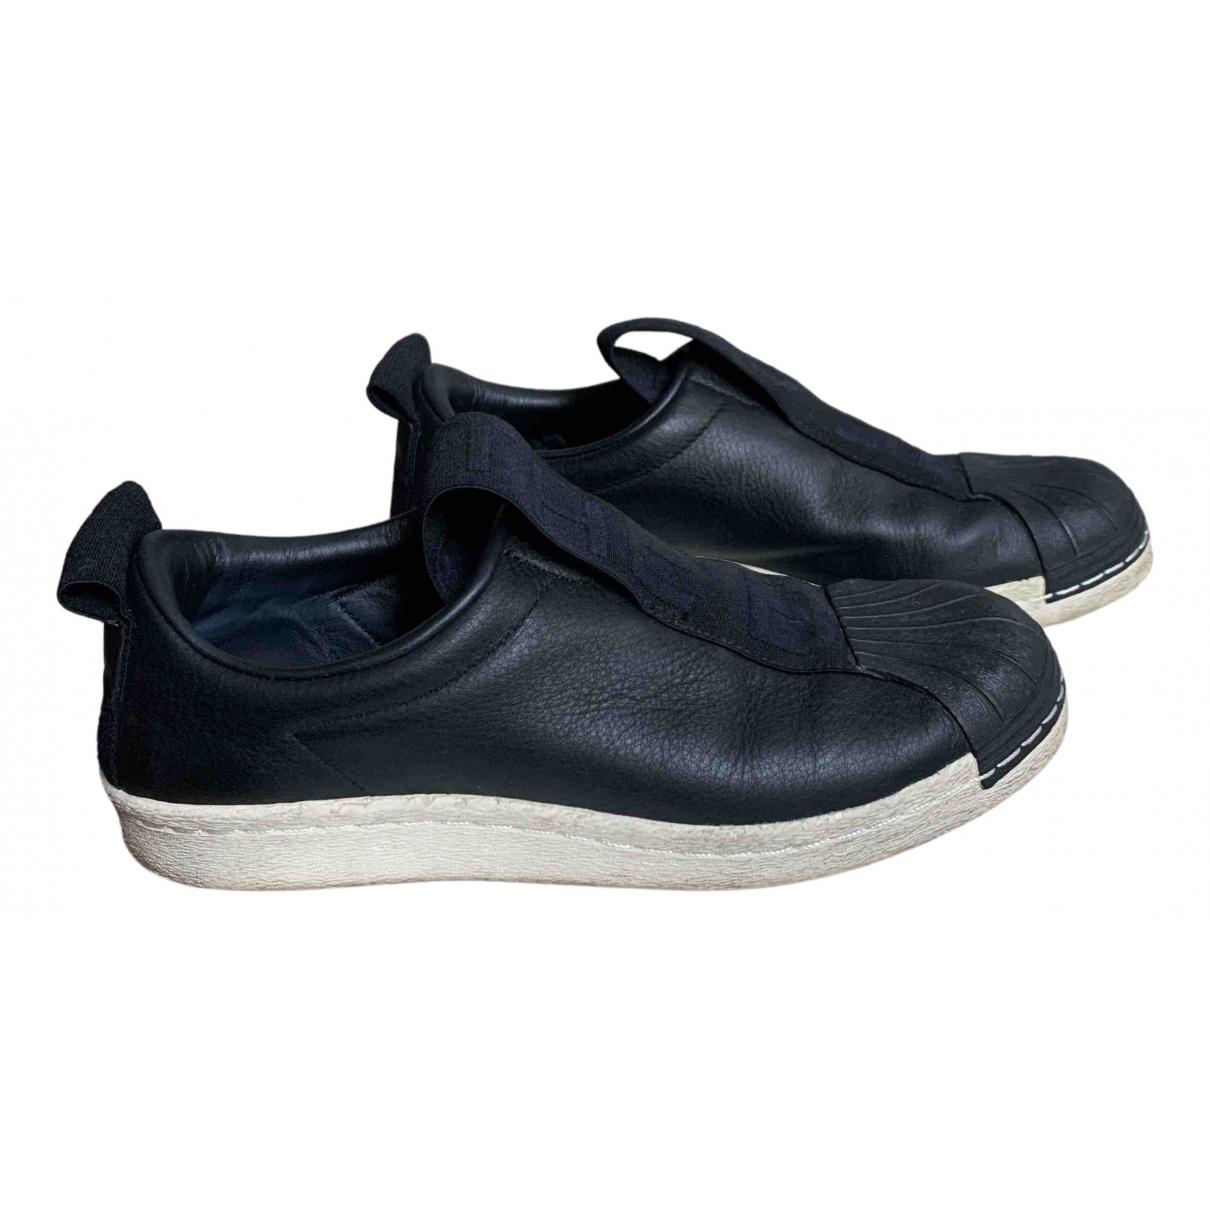 Adidas Superstar Sneakers in  Schwarz Leder